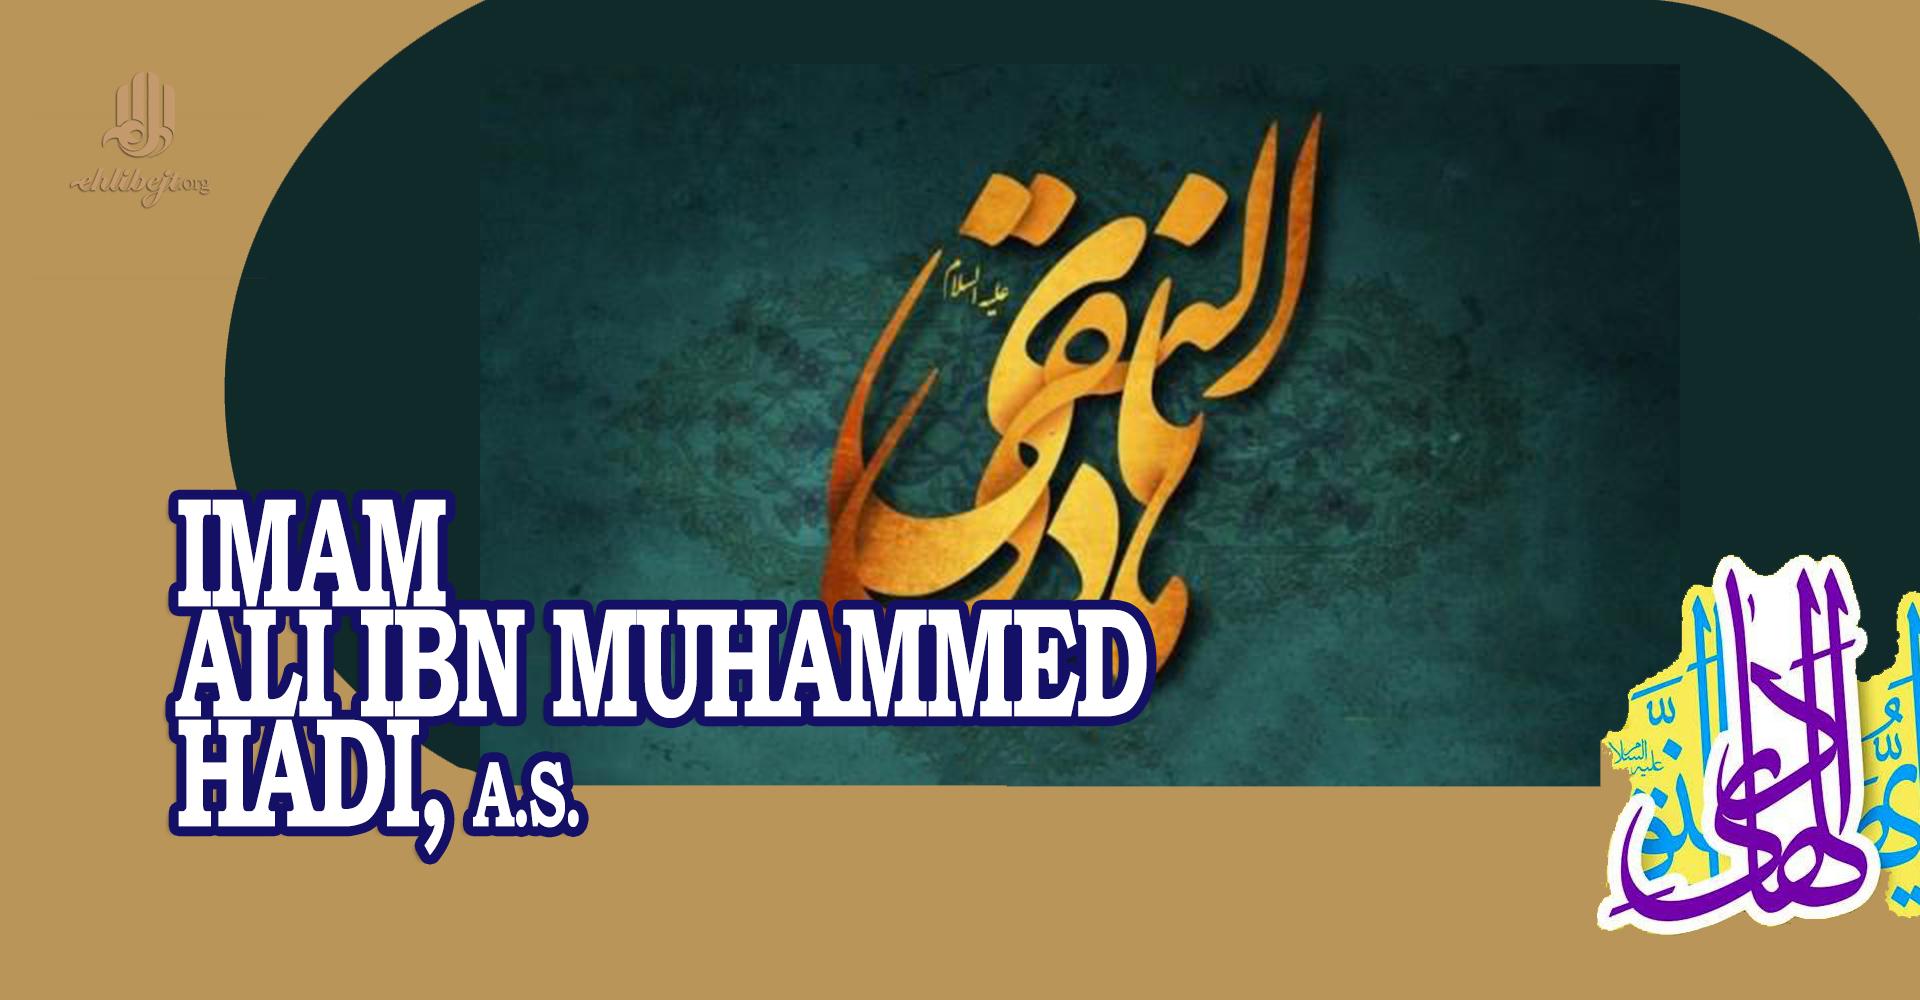 Imam Ali ibn Muhammed Hadi, a.s.